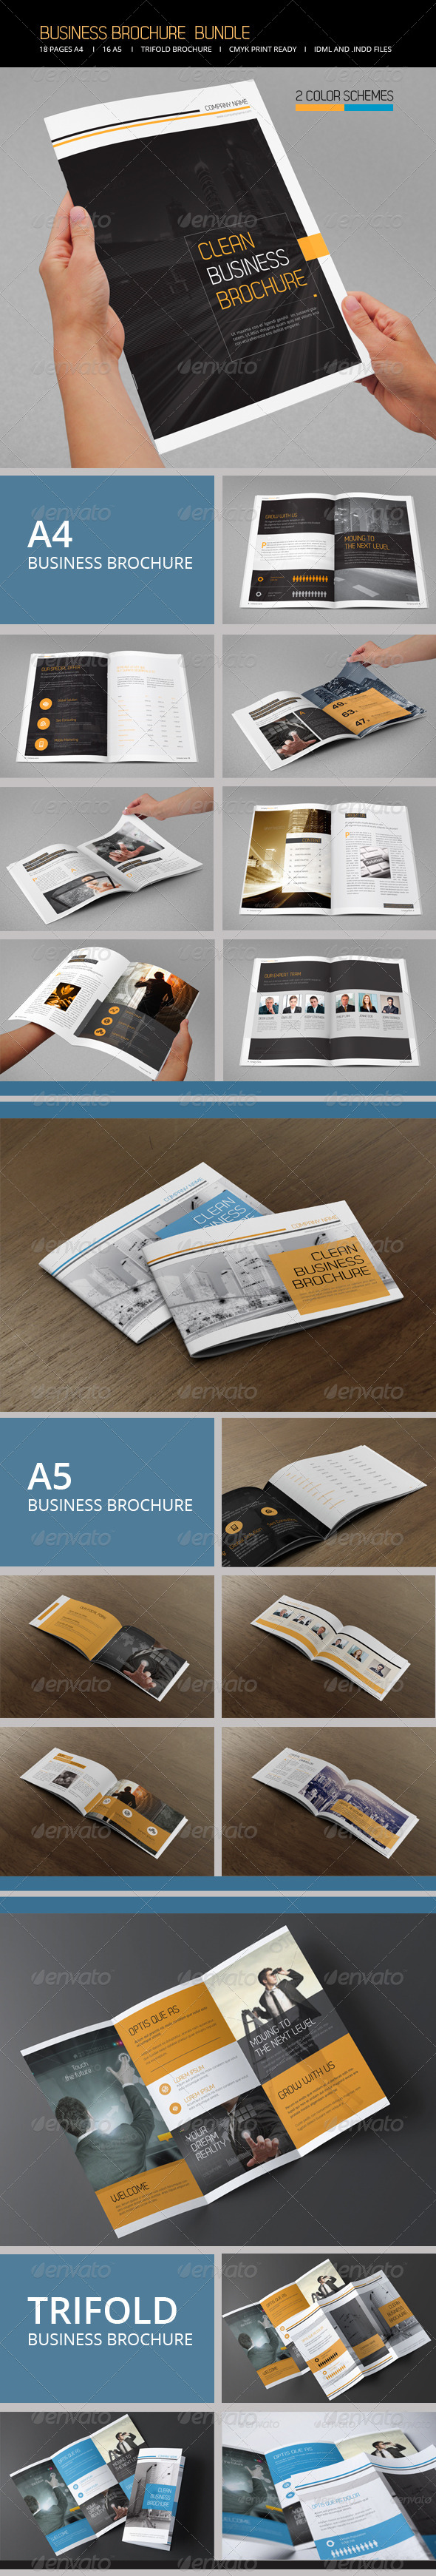 Business Brochure Bundle - Informational Brochures